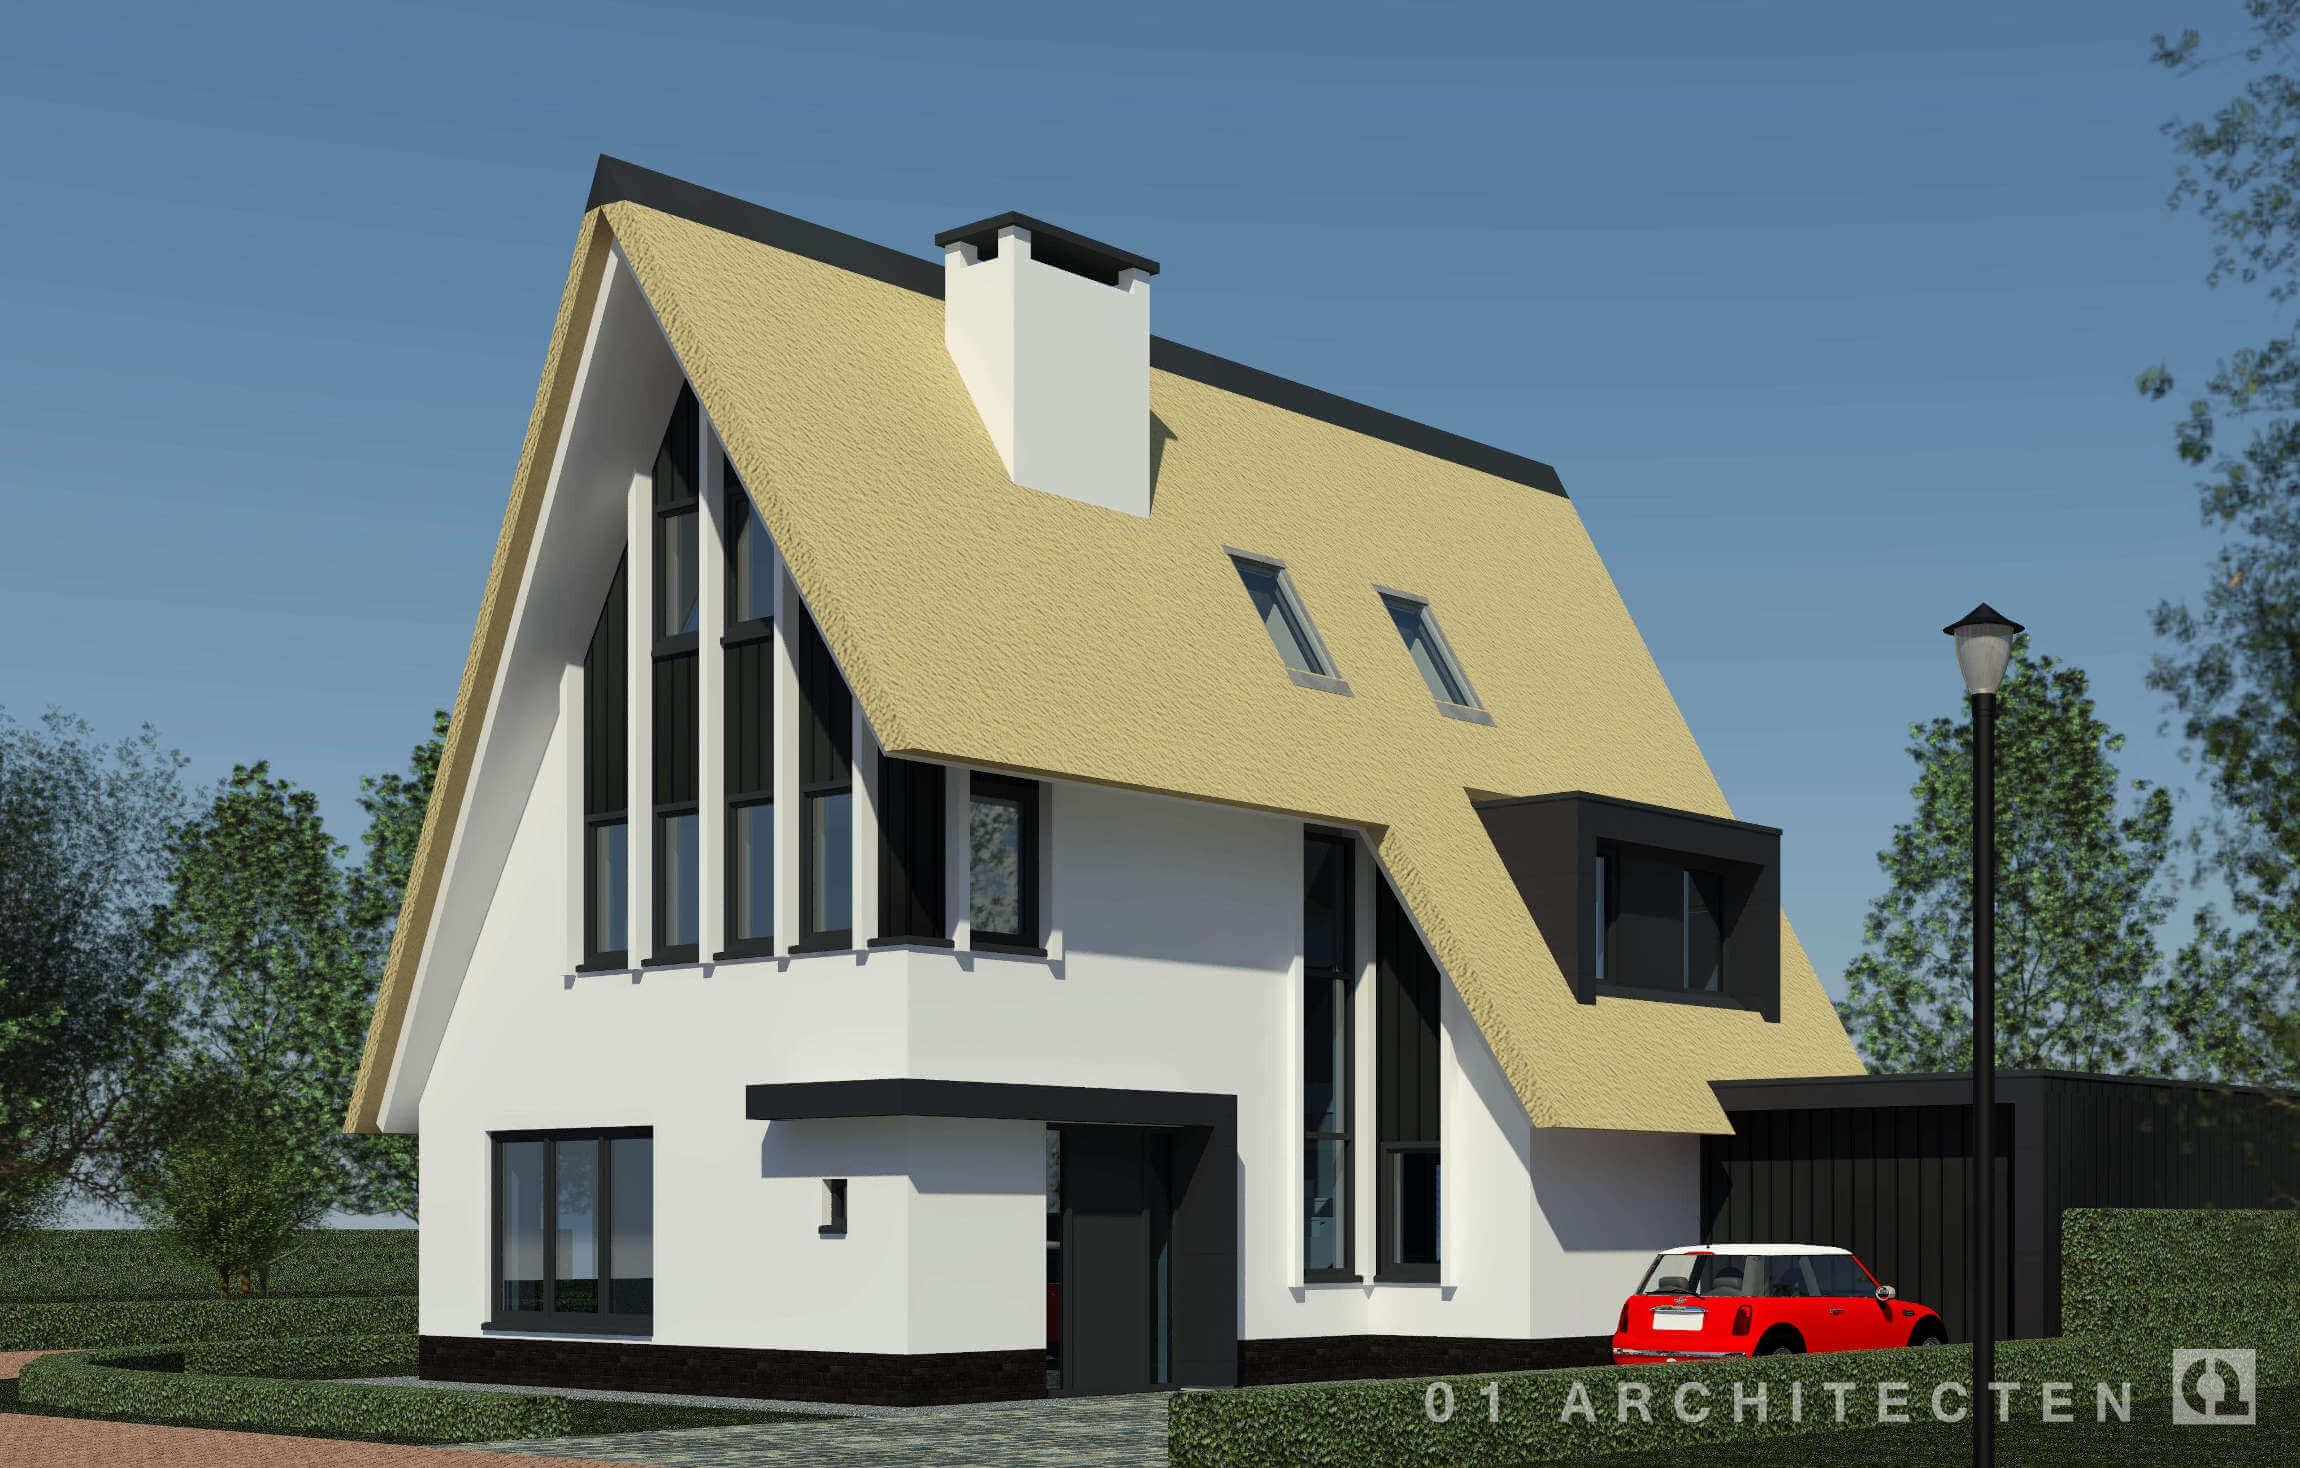 Architect verbouw woningen en villa 39 s archieven 01 for Architecten moderne stijl